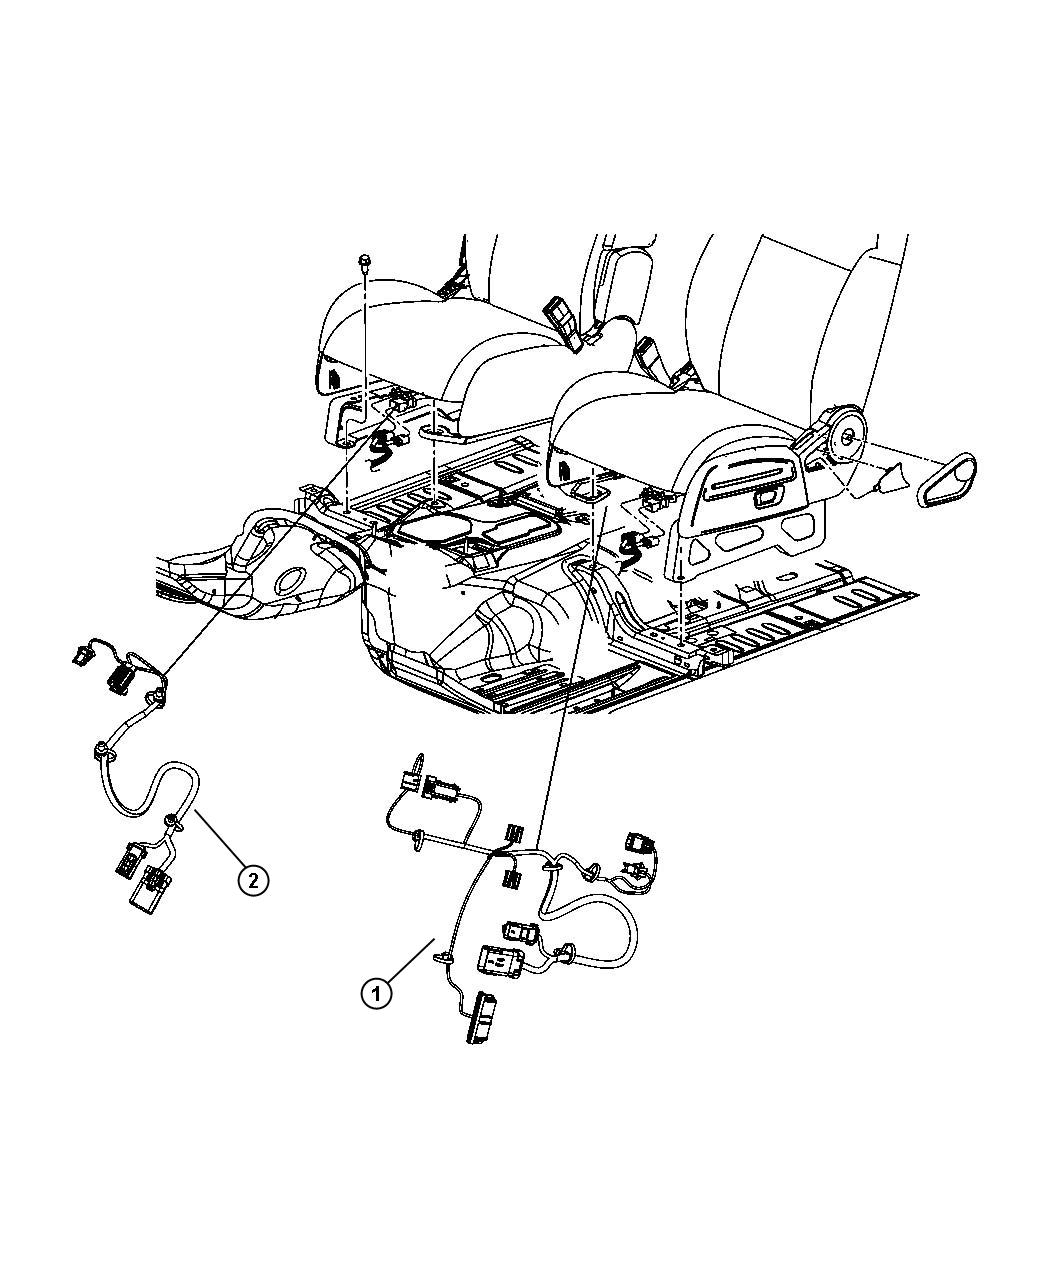 Jeep Liberty Wiring Power Seat Seat Driver 6 Way